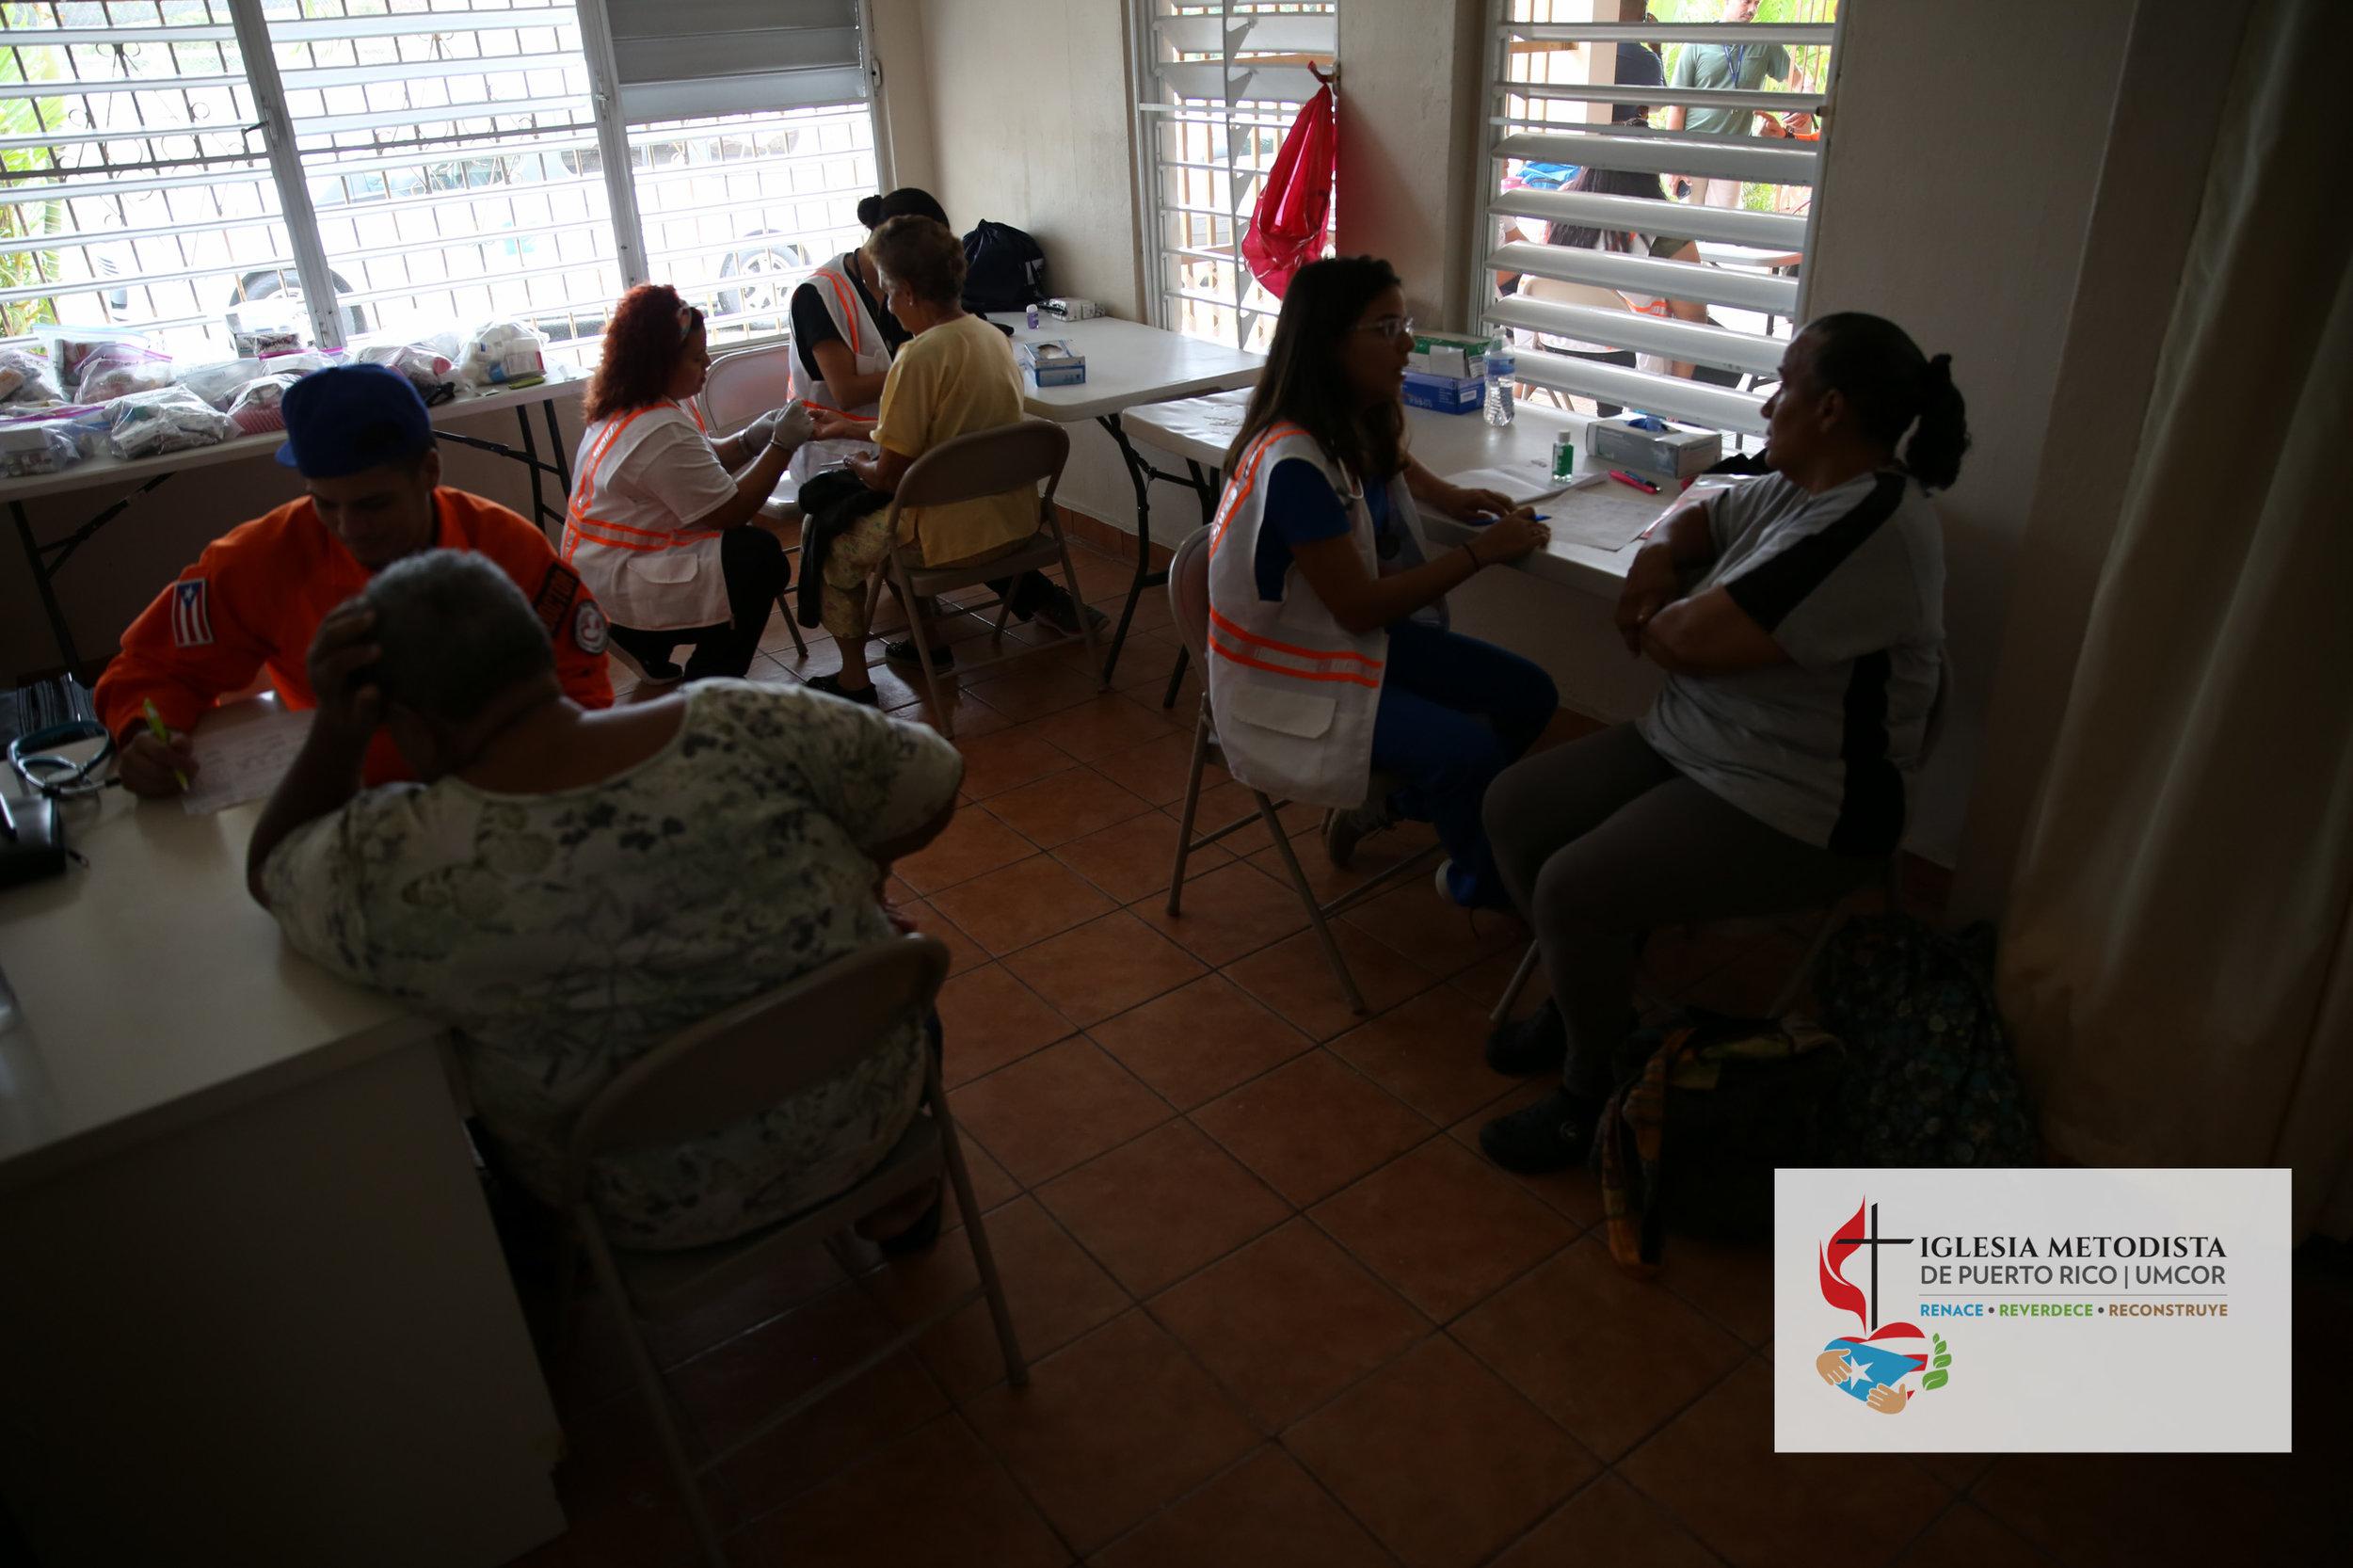 Fotos Clínicas de Salud Vieques_Abril 2018-ESG52374.JPG